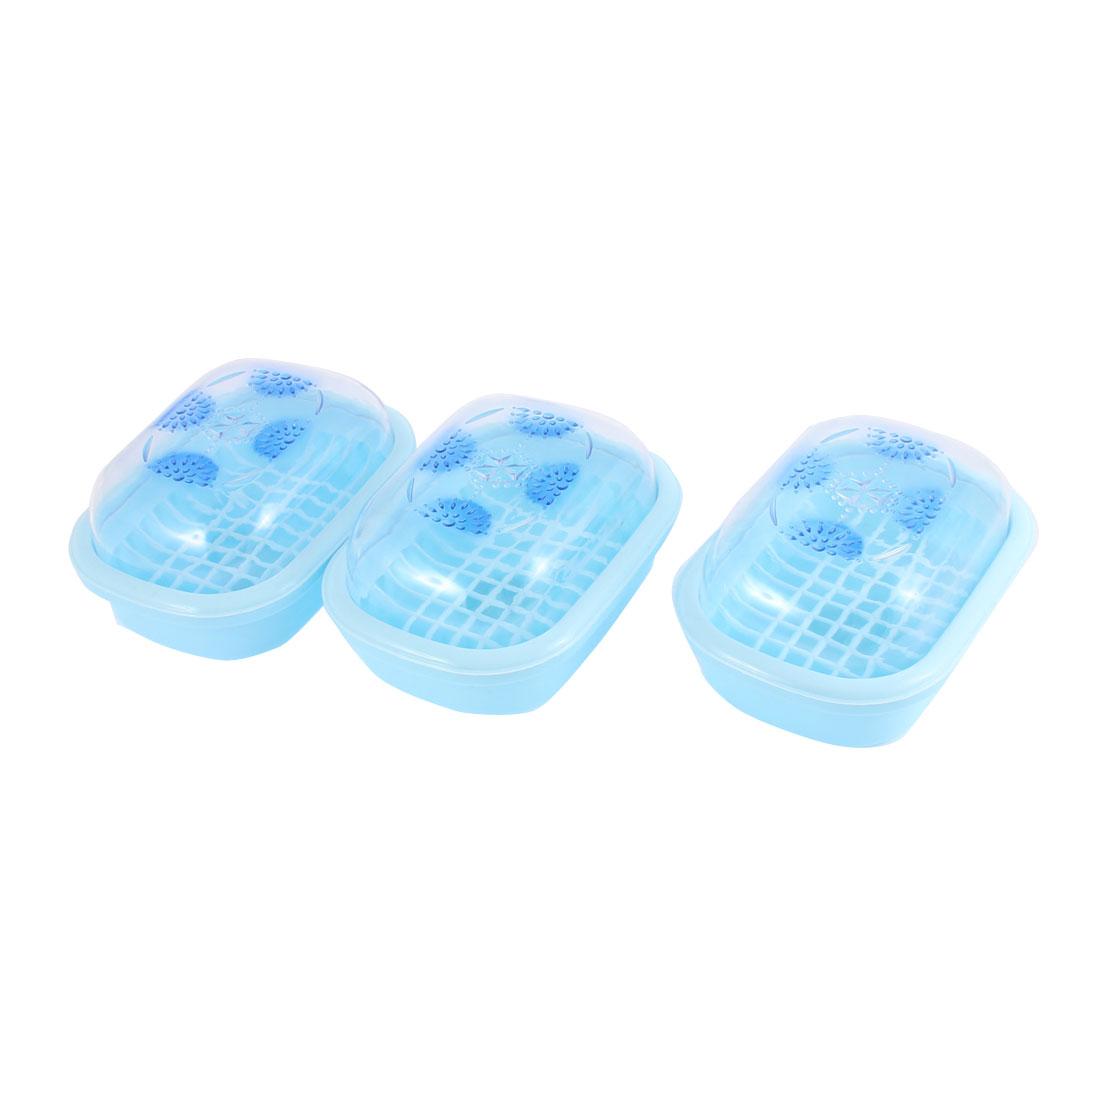 Washroom Plastic Rhinestone Pattern Dual Layer Soap Dish Case Holder Blue 3 Pcs